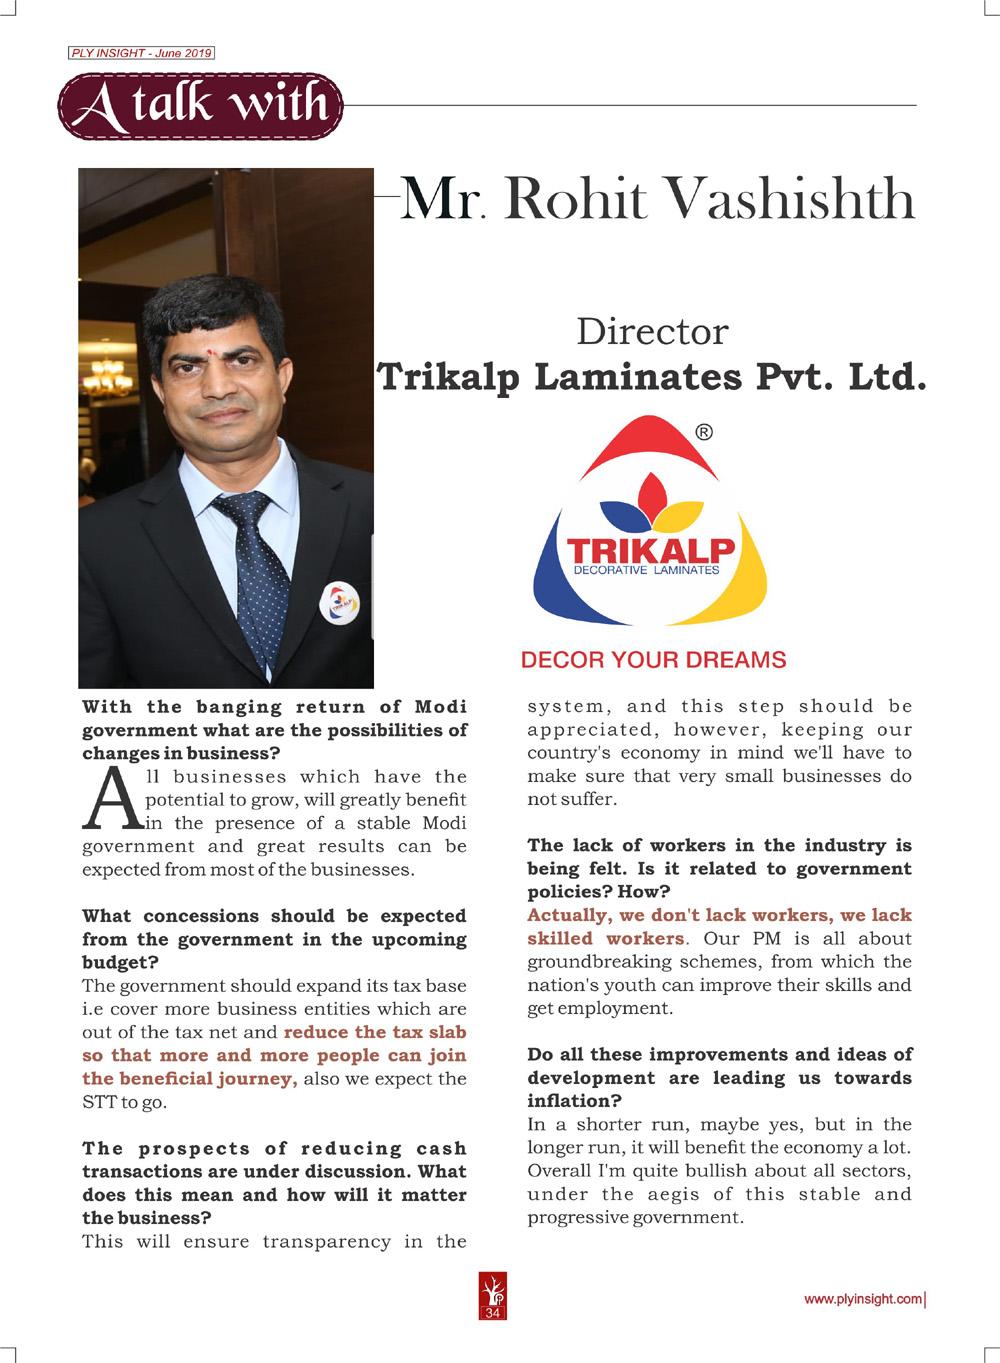 Mr. Rohit Vashishth